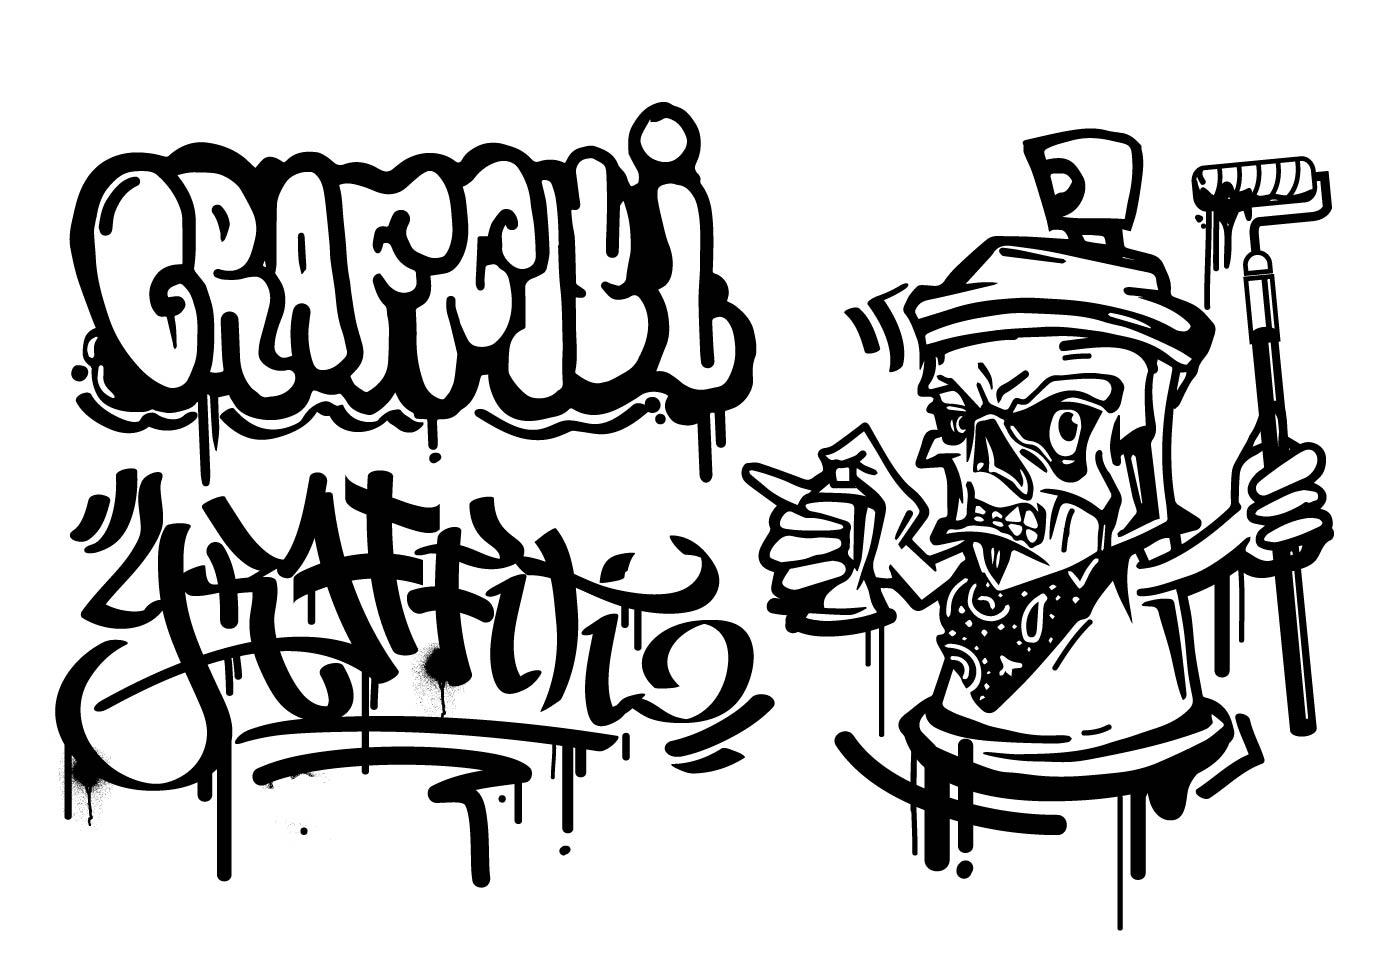 Graffiti Cartoon Character Download Free Vectors